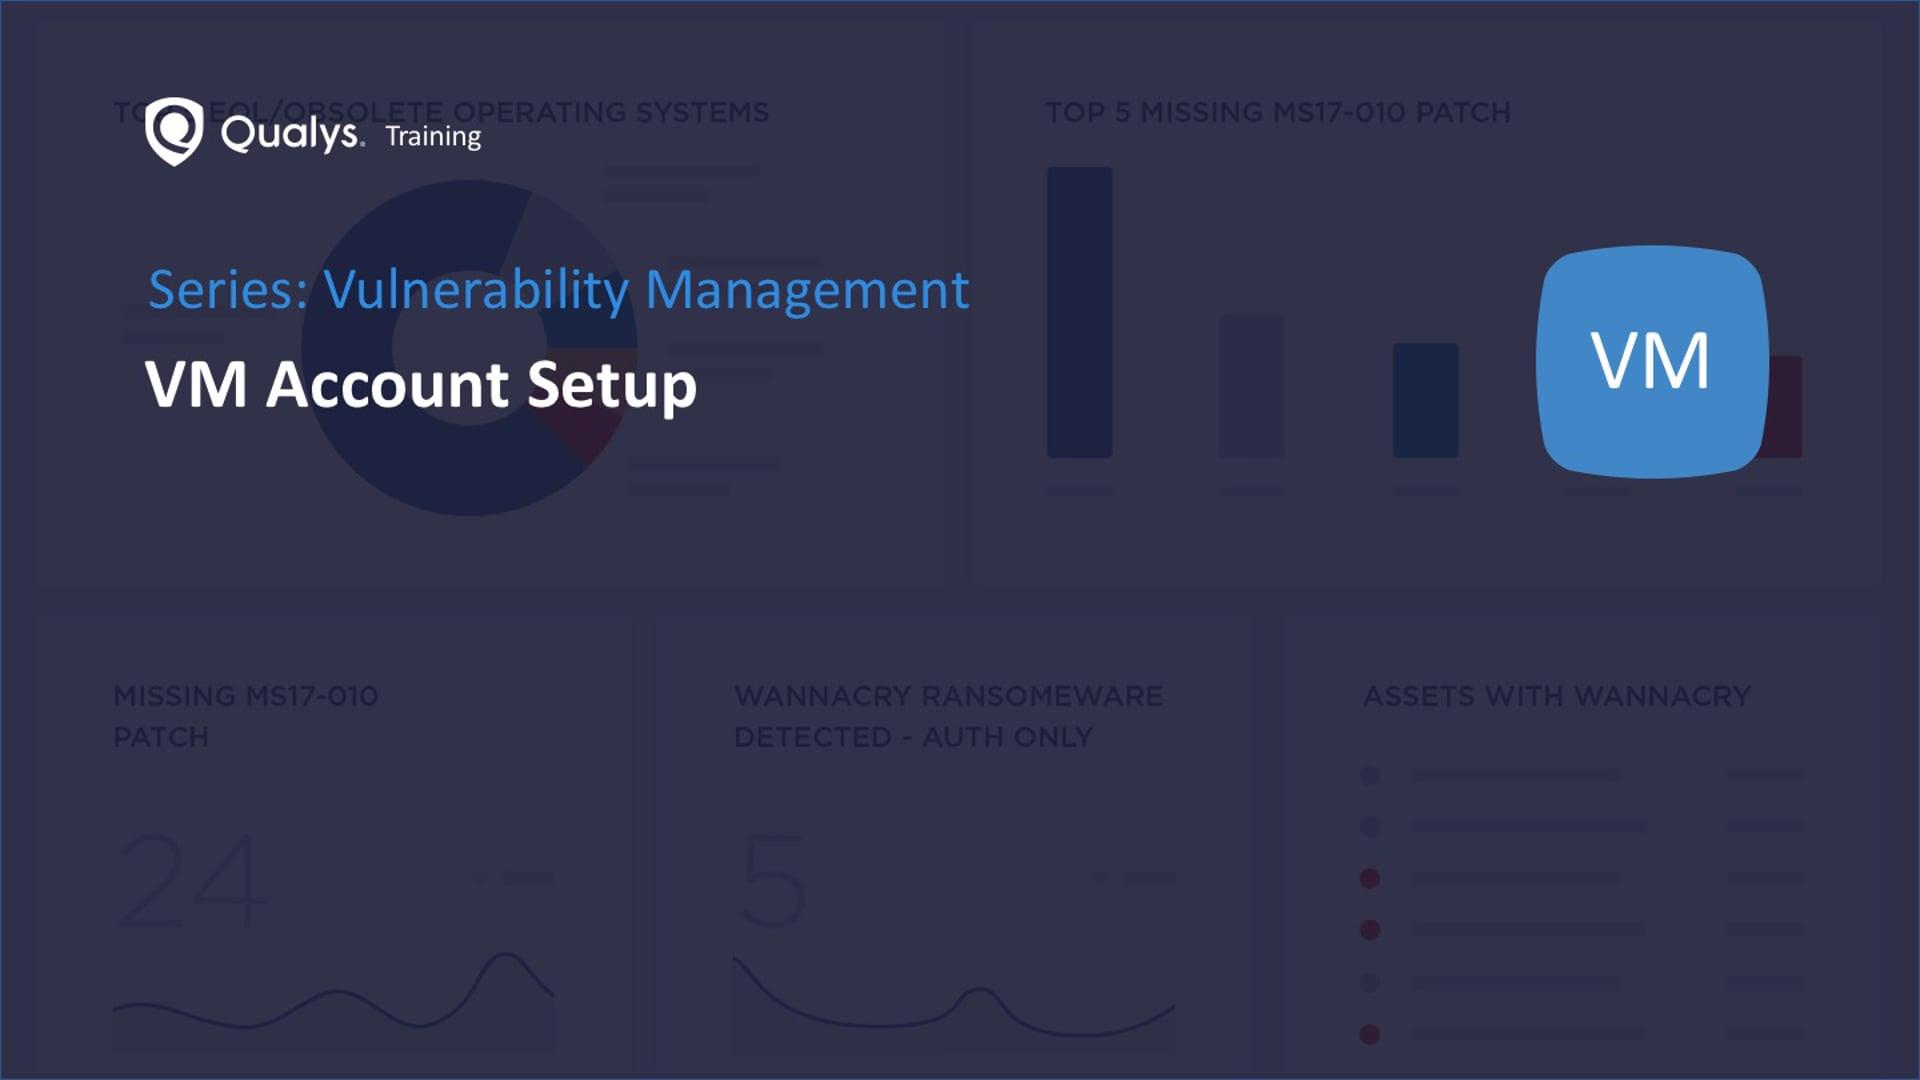 VM Account Setup